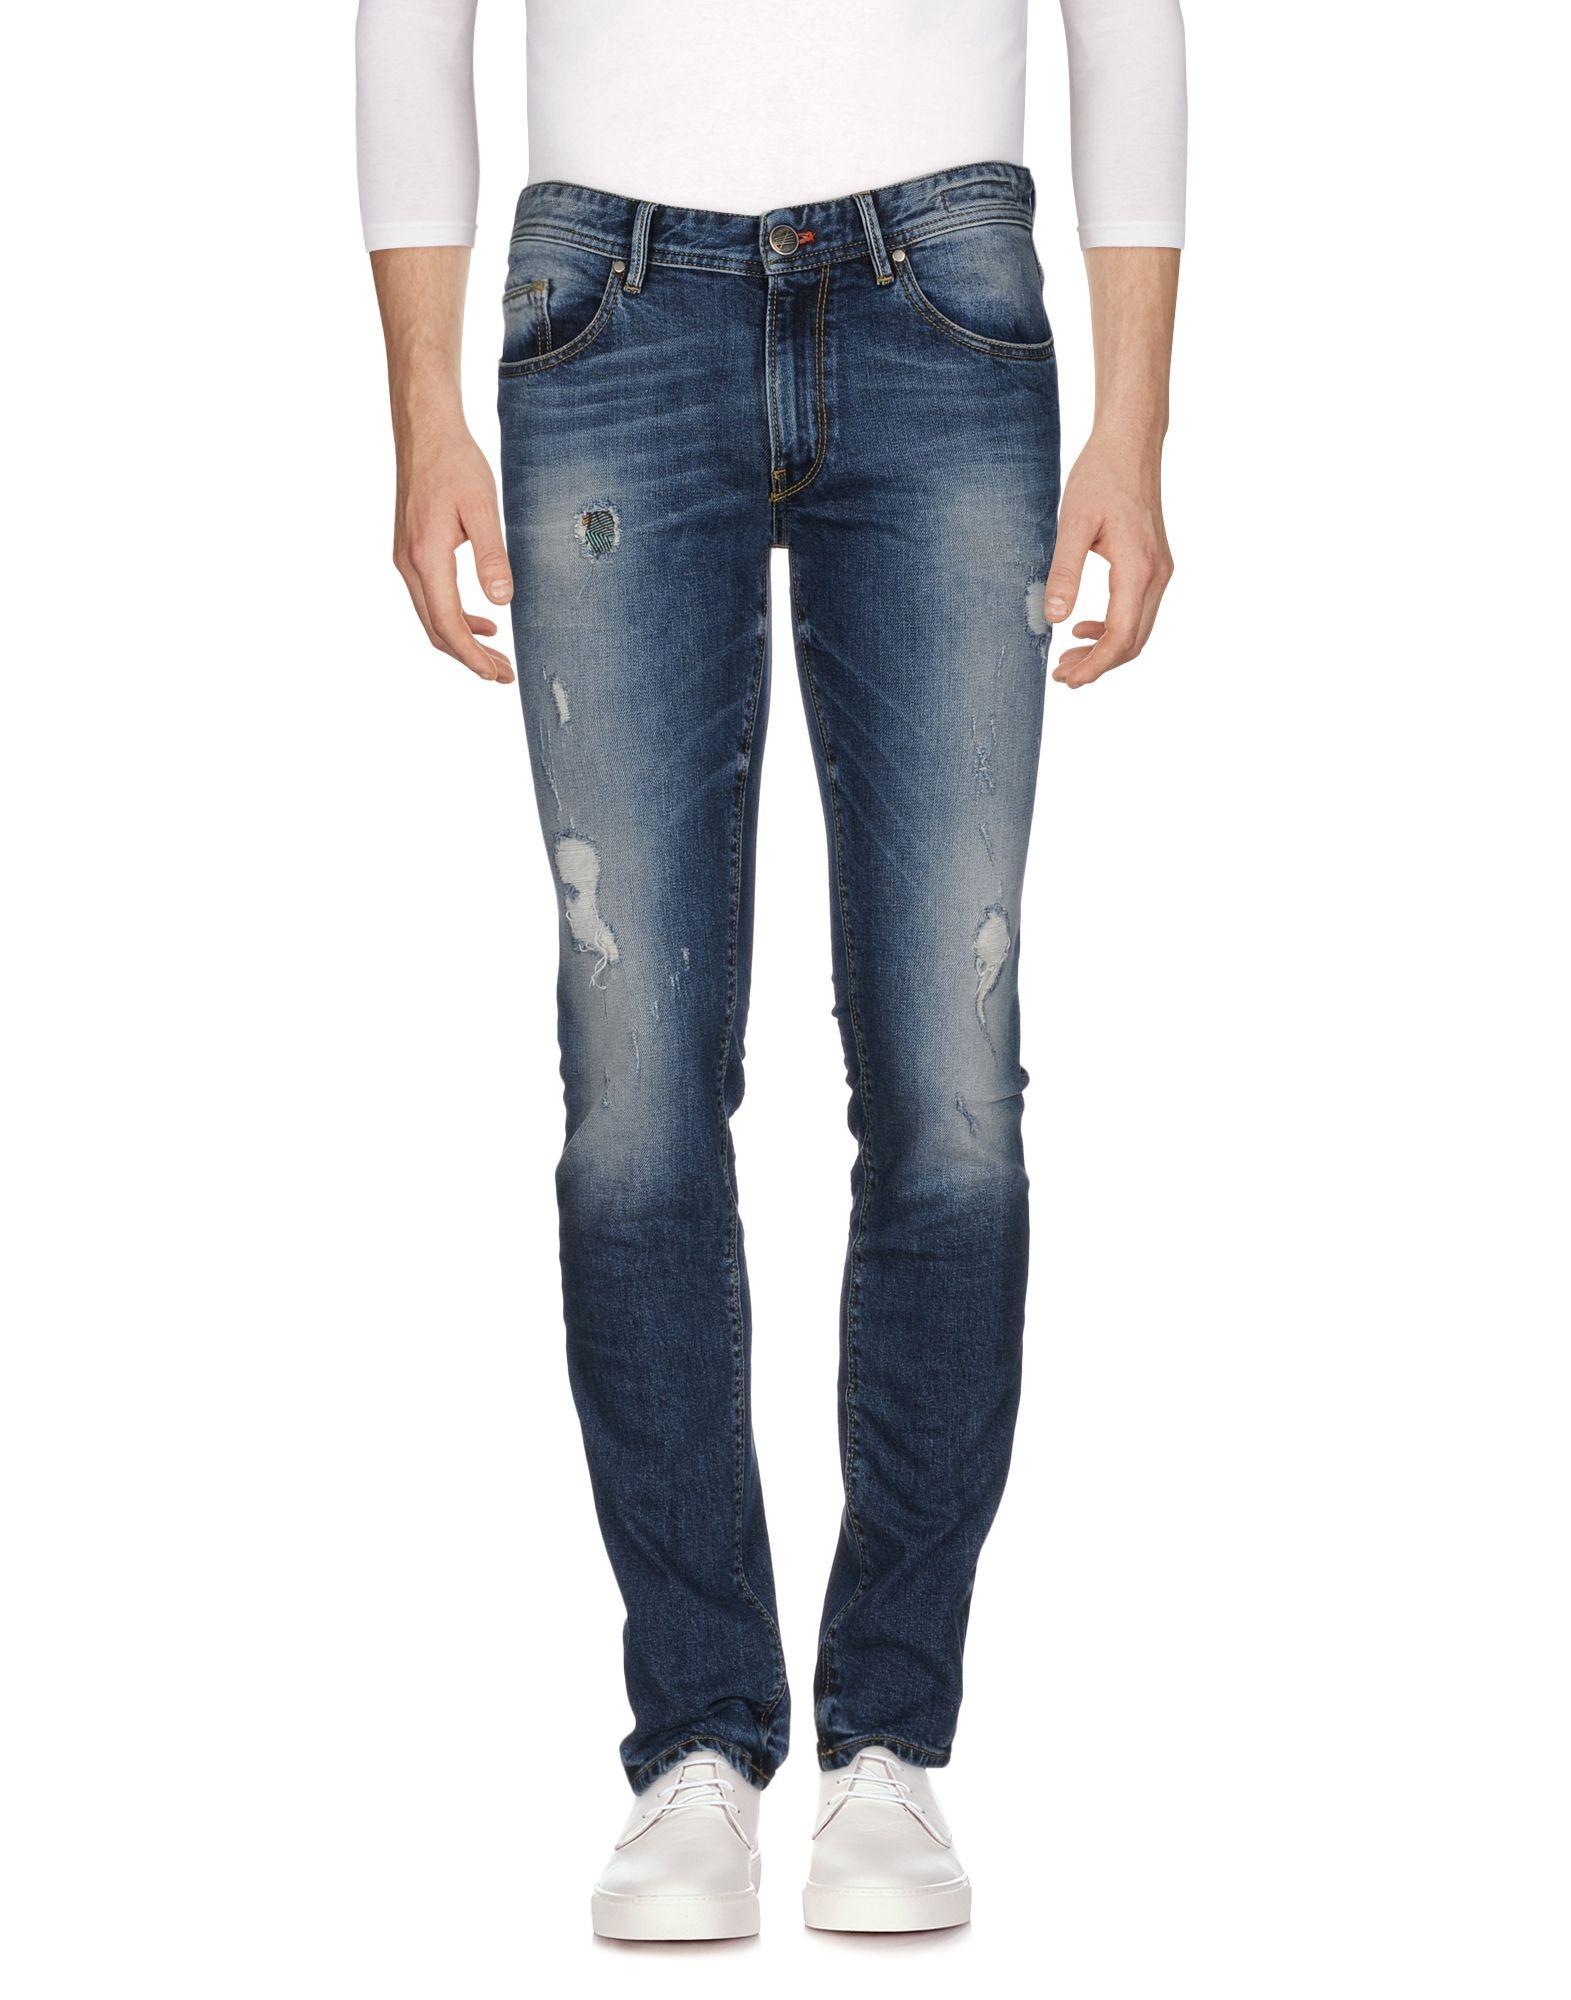 Pantaloni Jeans Pt05 Uomo - Acquista online su